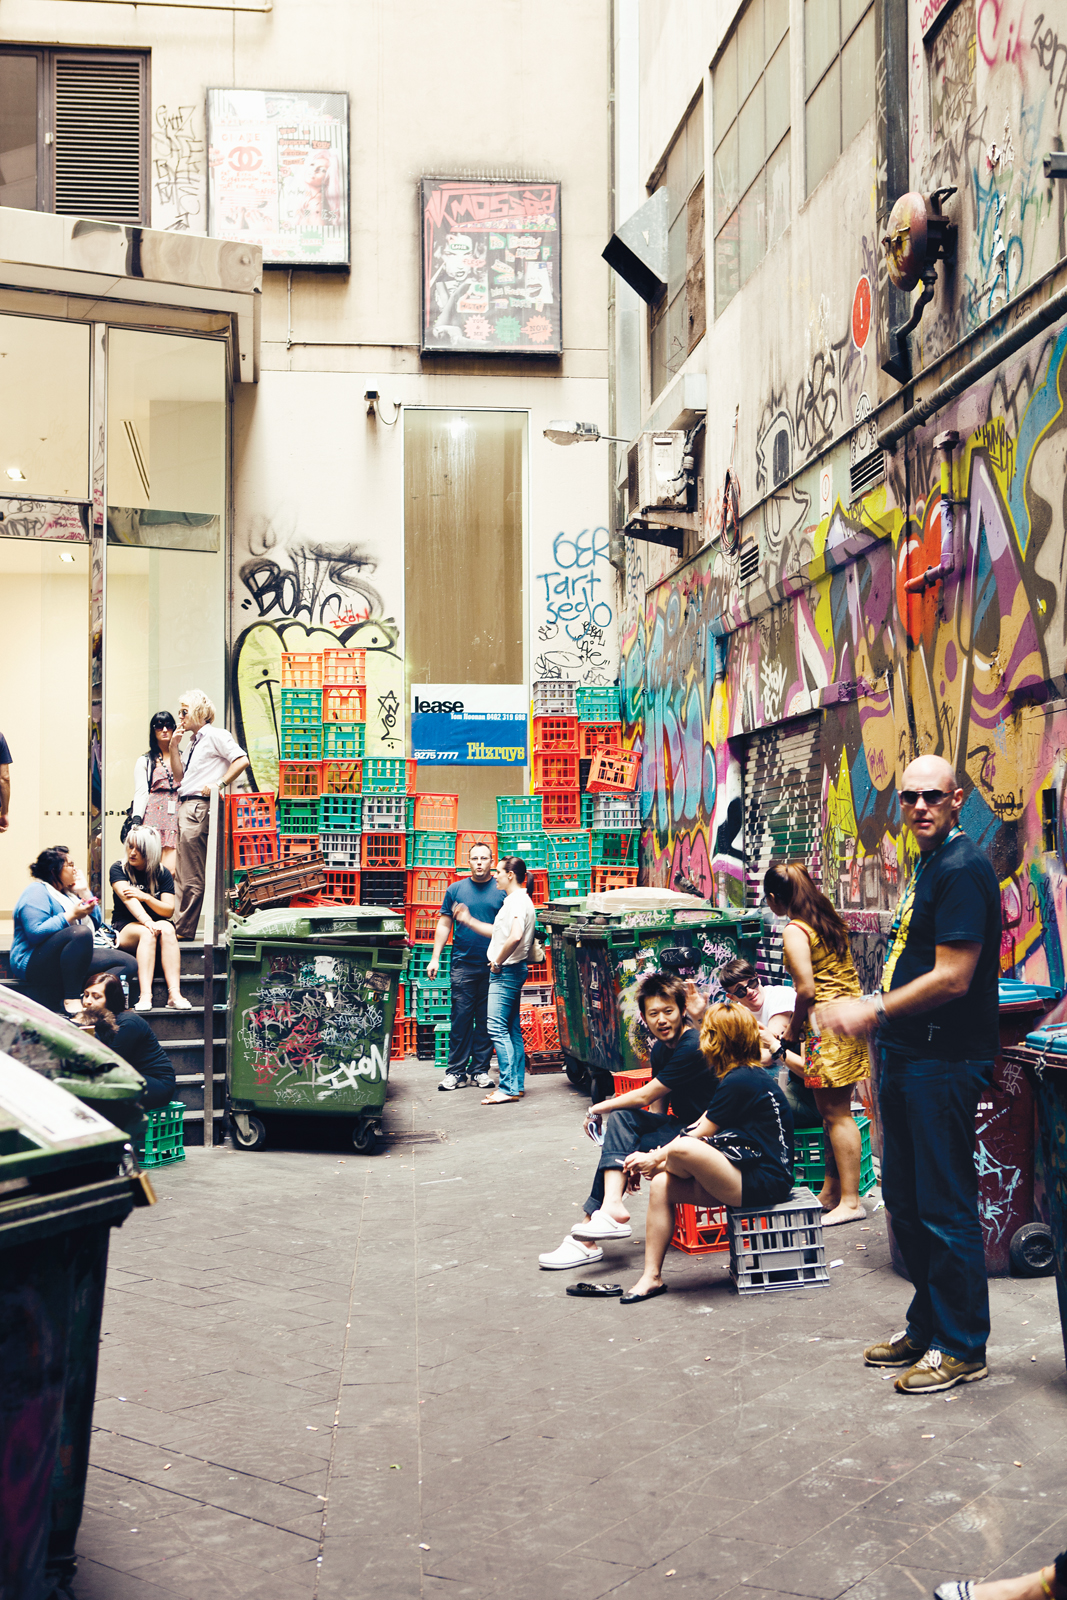 Croft Alley lane in Melbourne, Australia